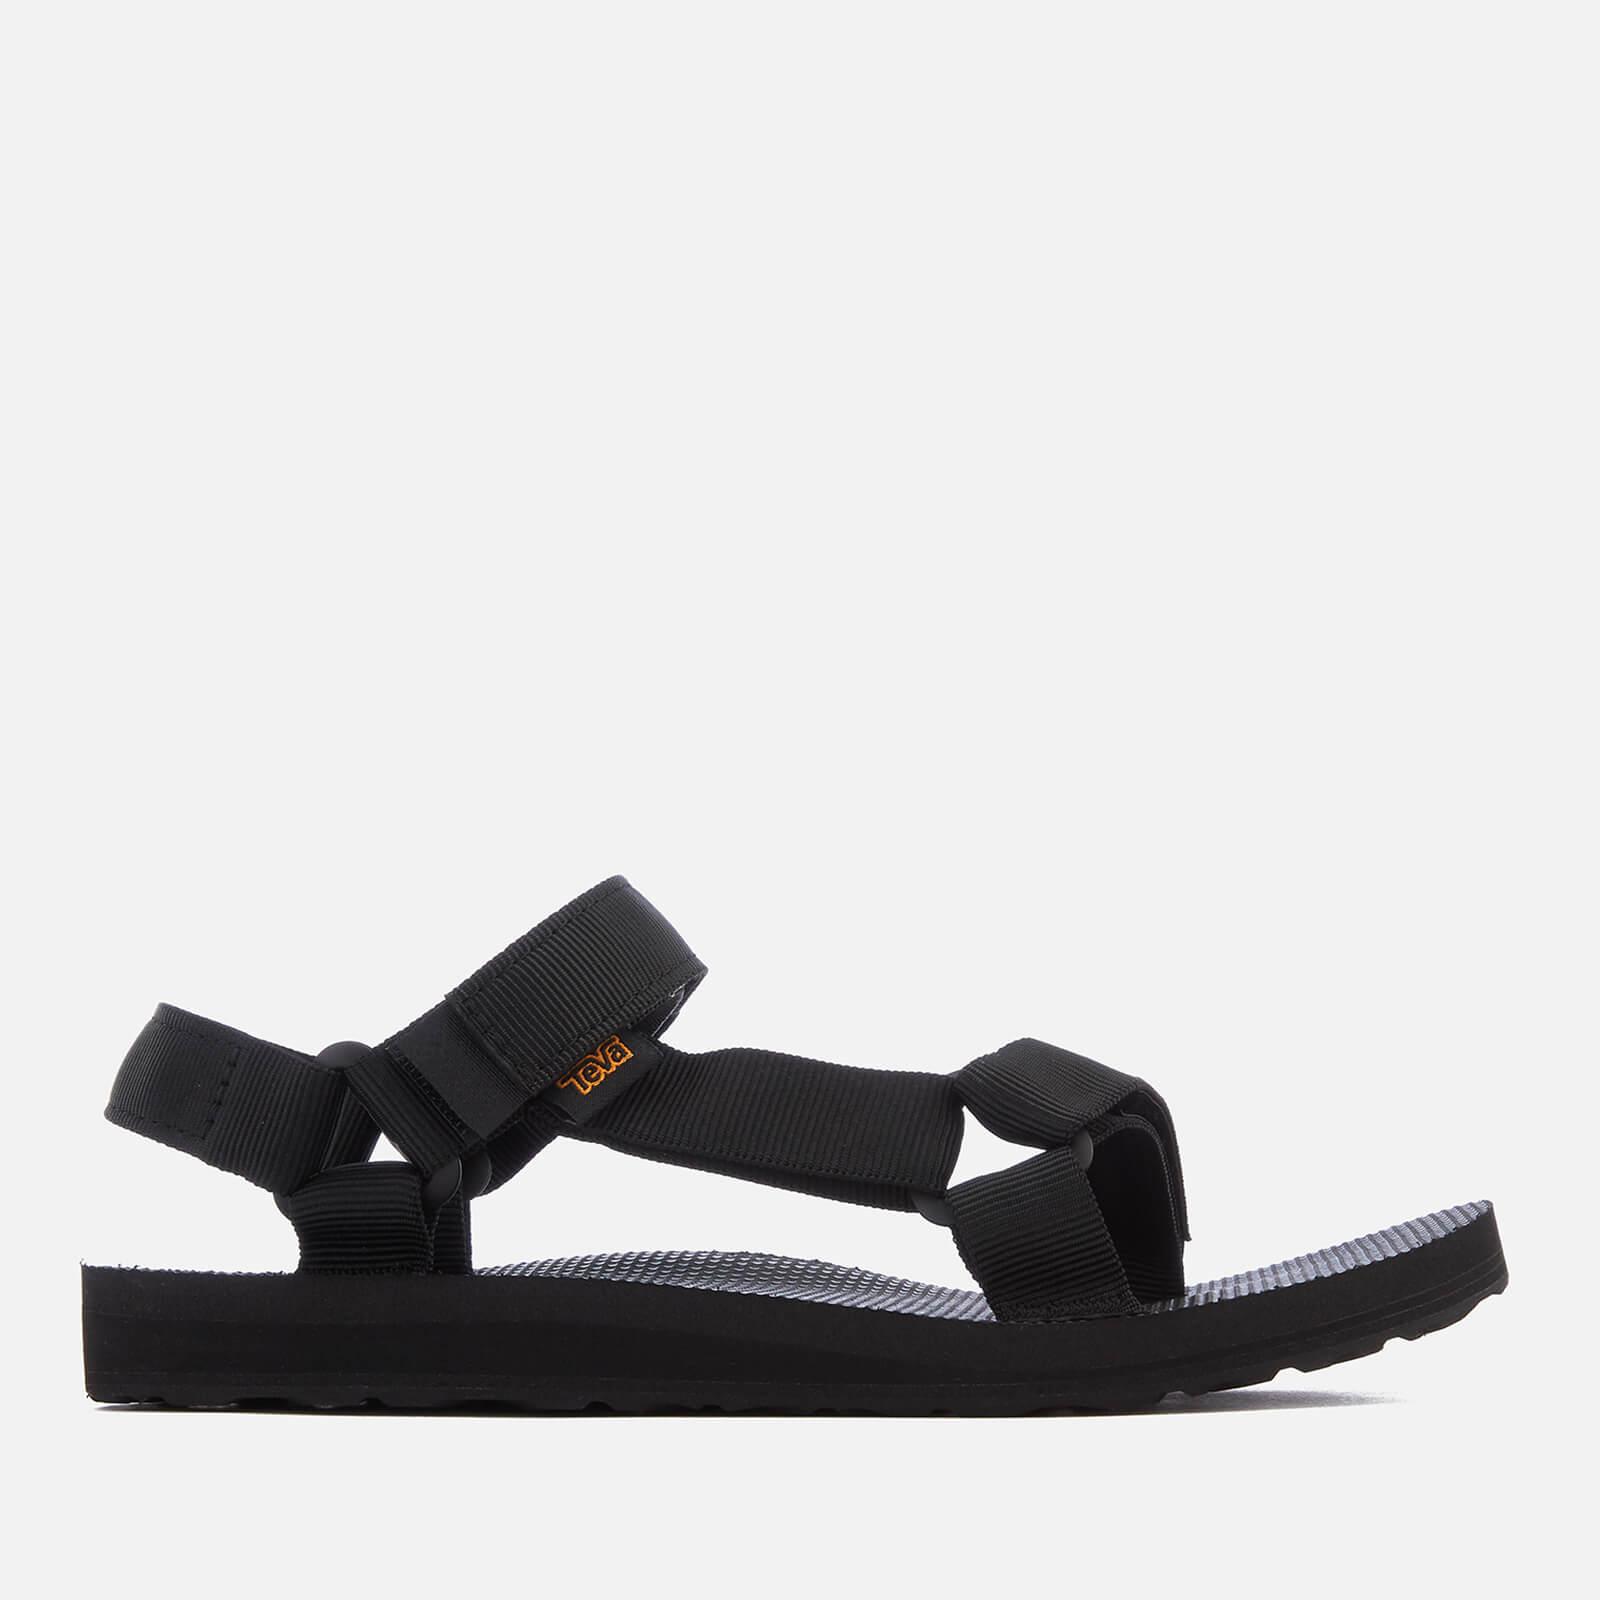 Teva Women's Original Universal Sport Sandals - Black - UK 4